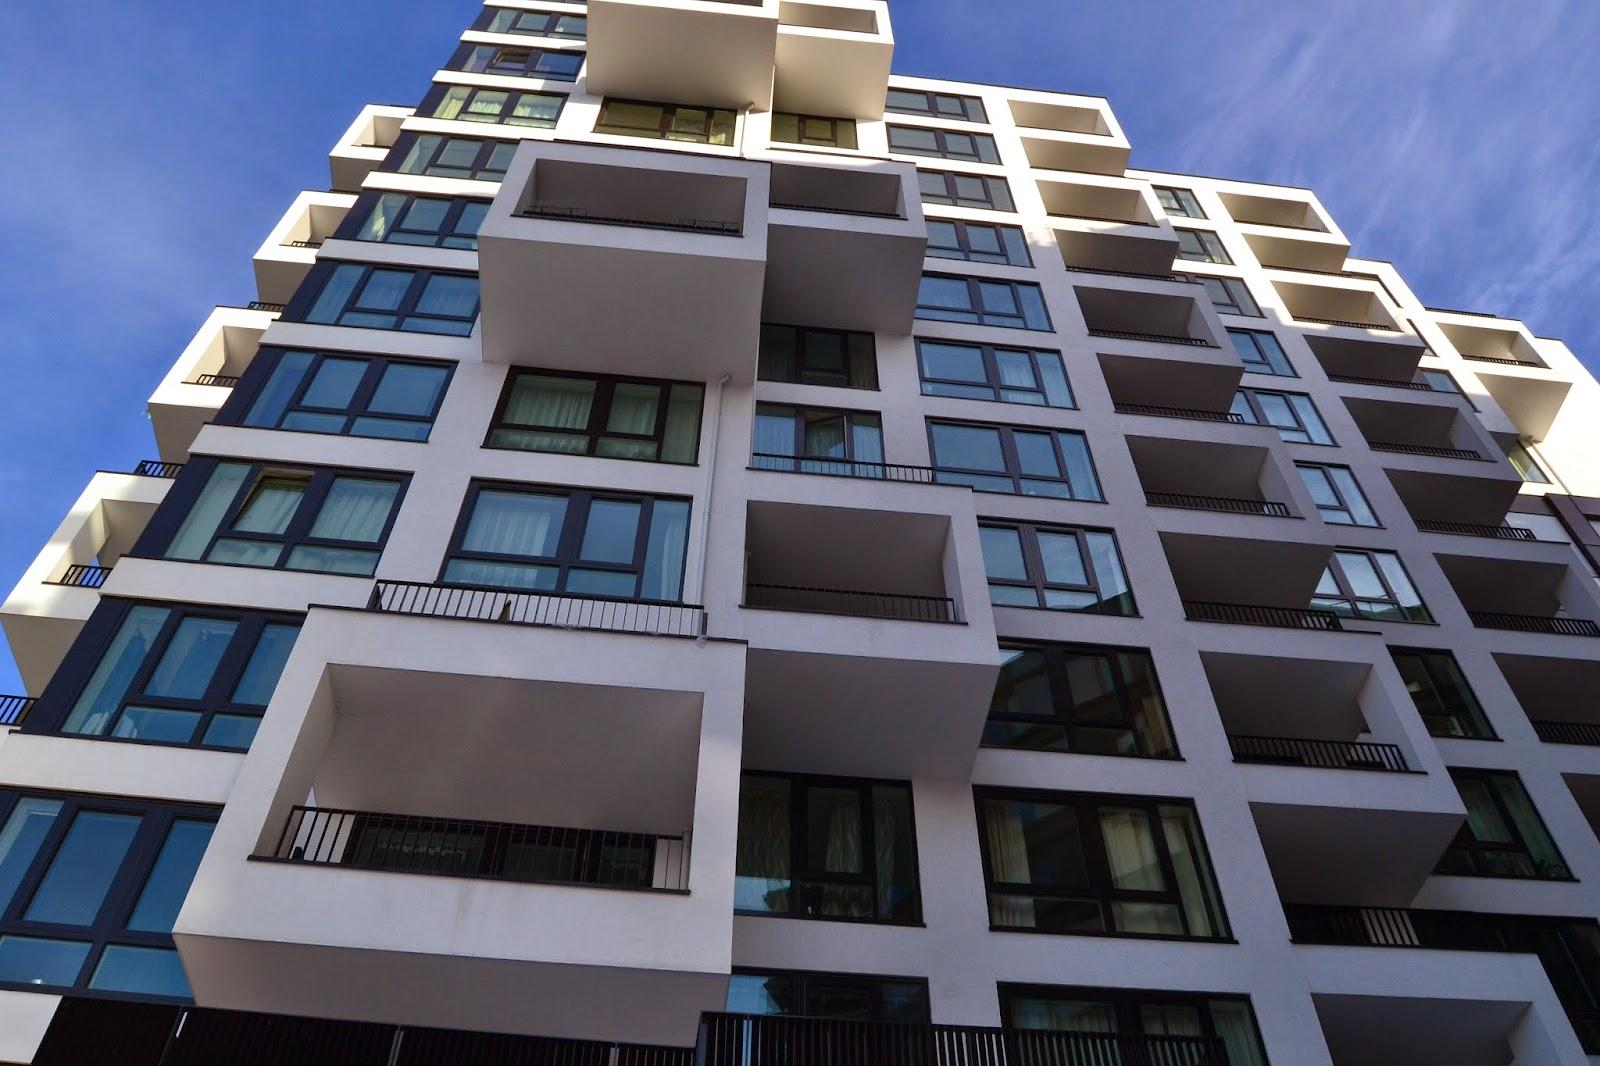 Oslo coolest apartment building